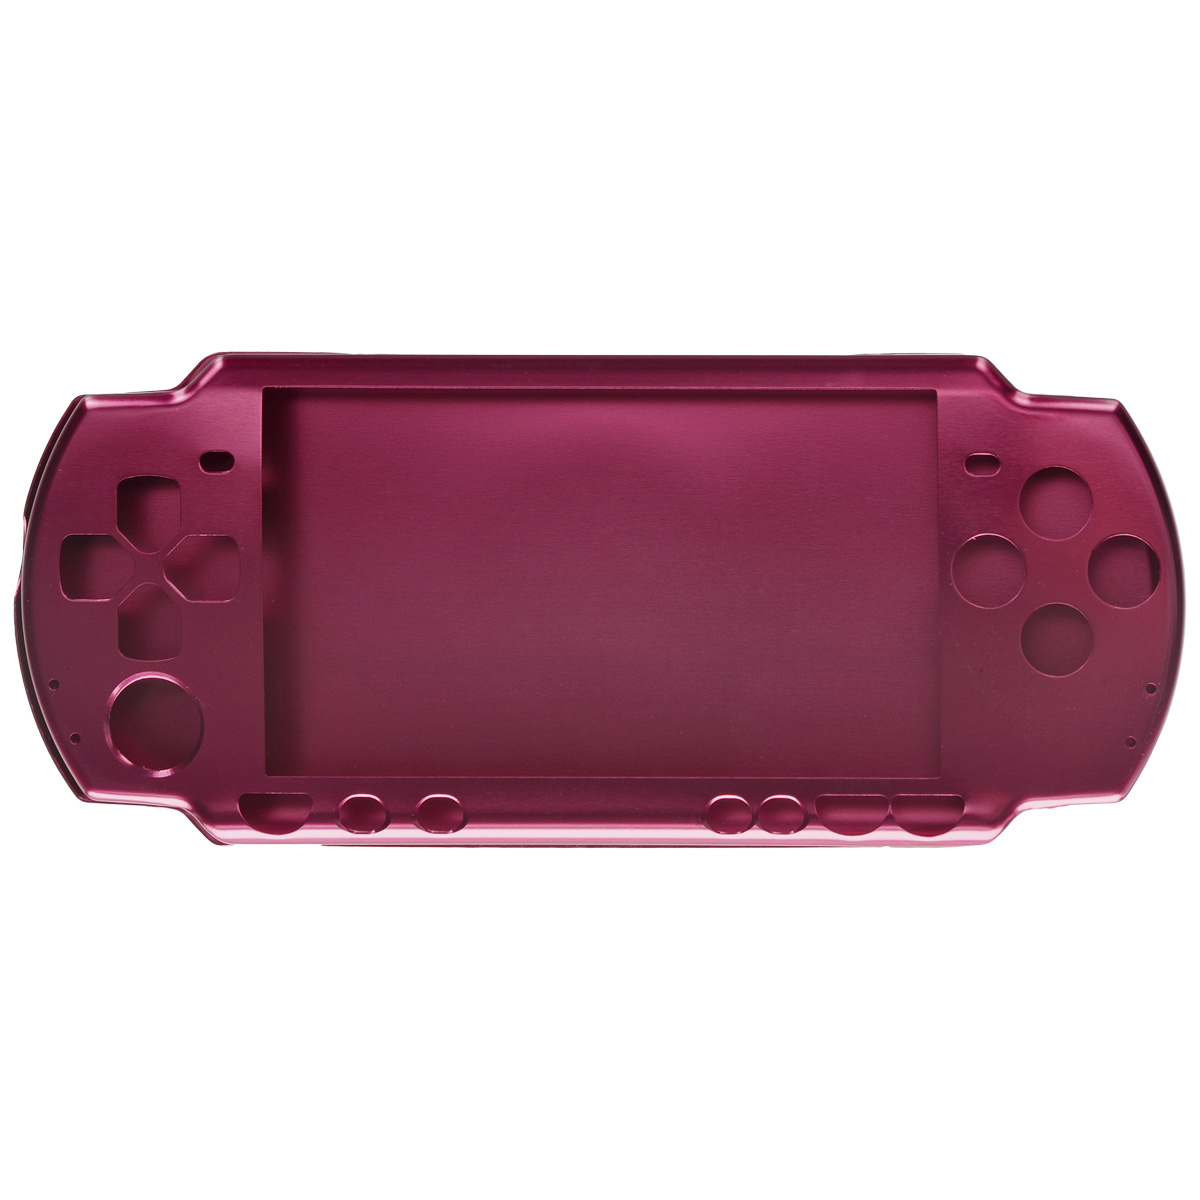 Алюминиевый защитный корпус Game Guru Luxе для Sony PSP 2000/3000 (бордо) for sony sony psp 2000 3000 for psp 2000 3000